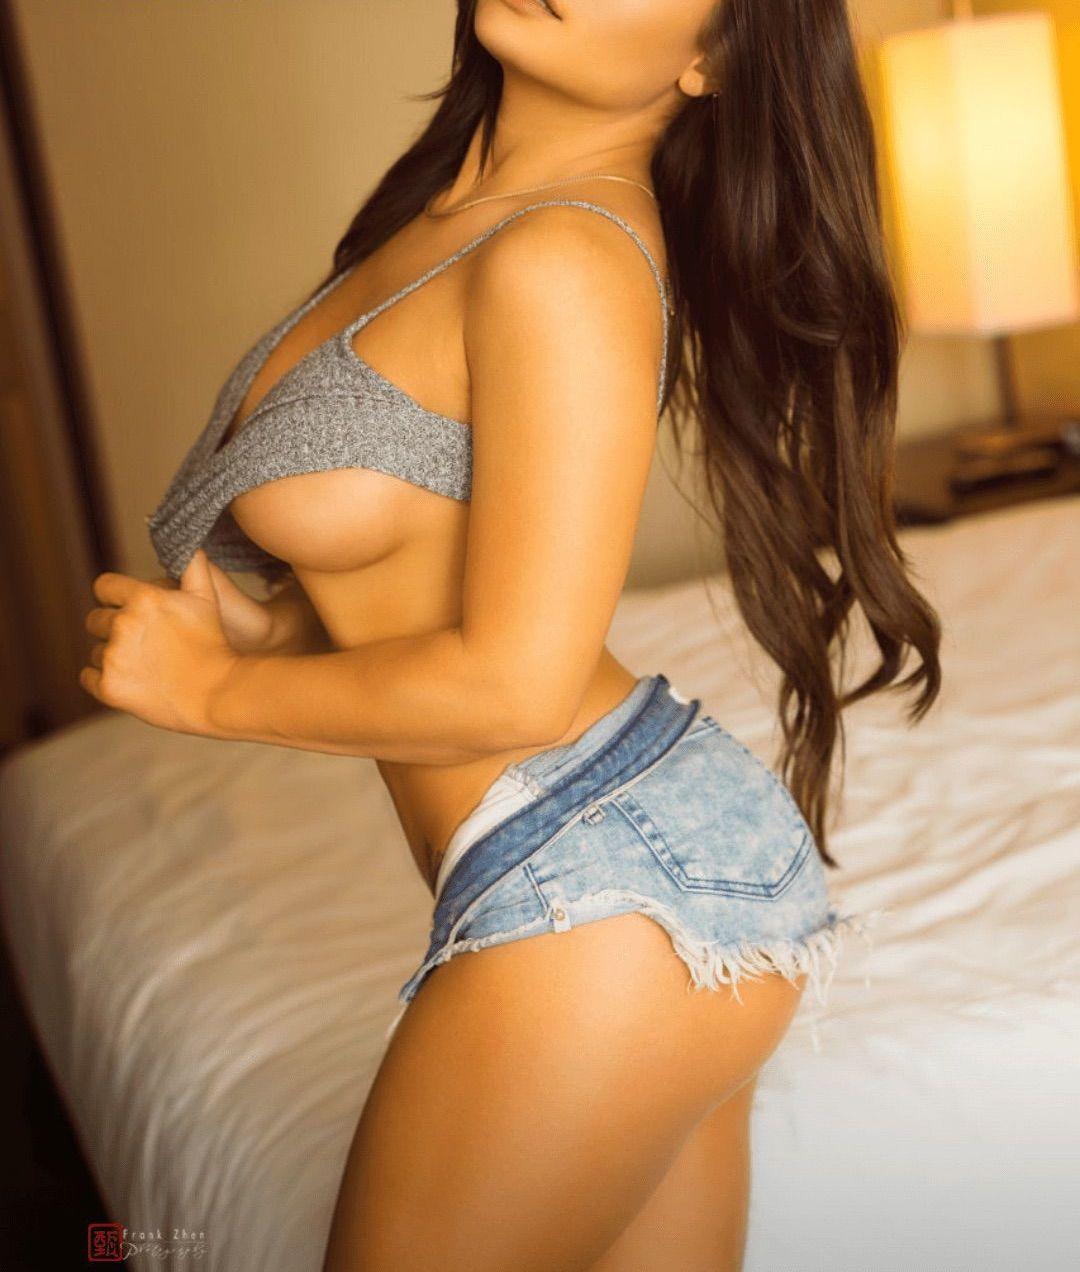 Jessica Sunok Jessicasunok Onlyfans Nudes Leaks 0035